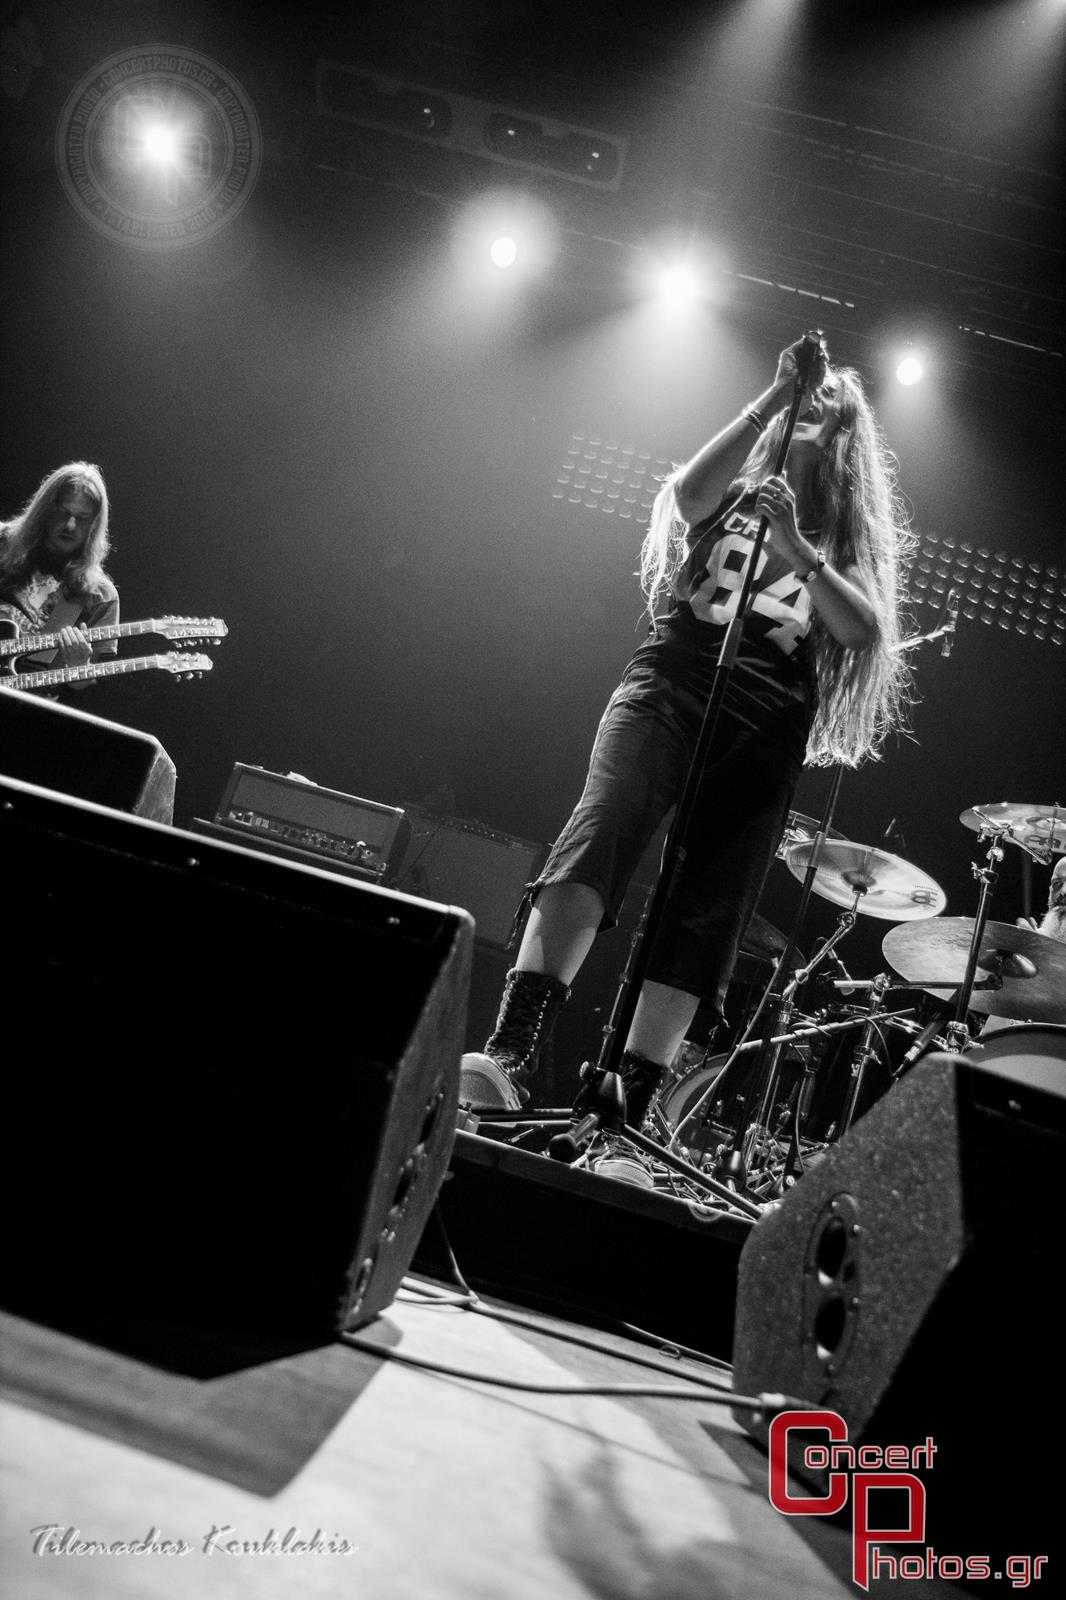 Neurosis-Neurosis photographer:  - concertphotos_20140707_23_56_49-2